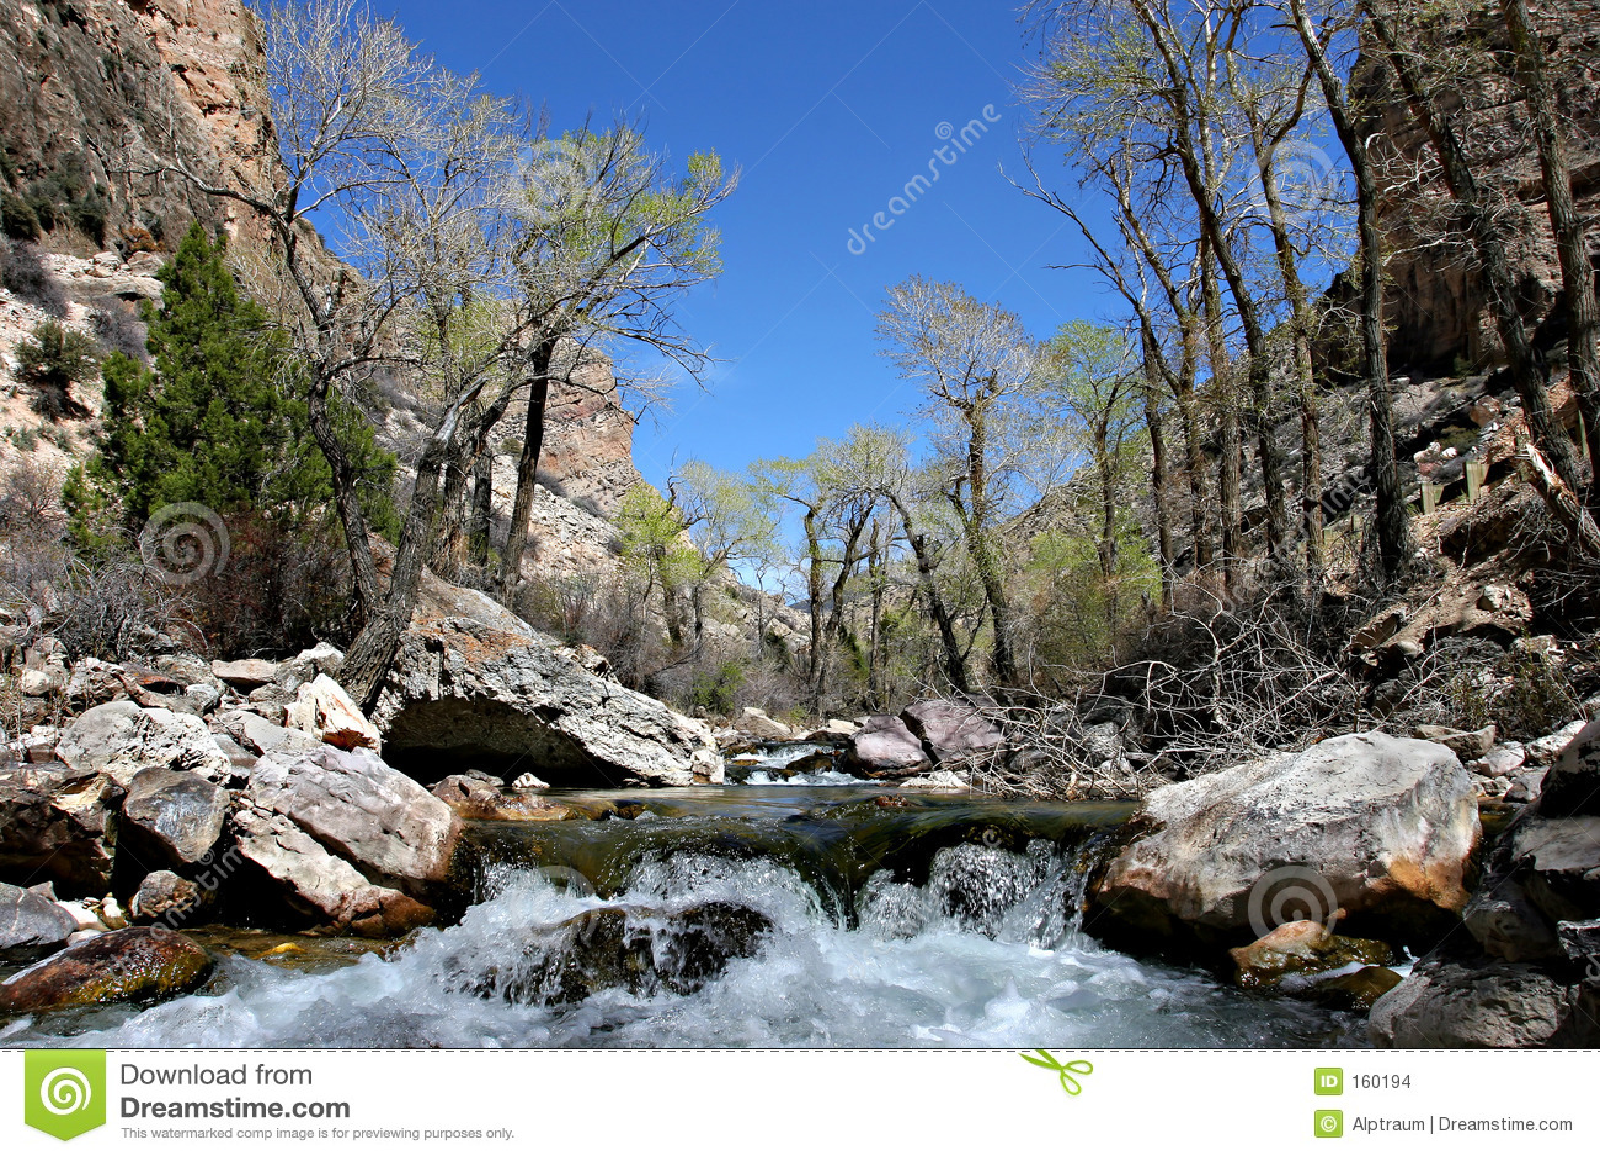 Shell creek